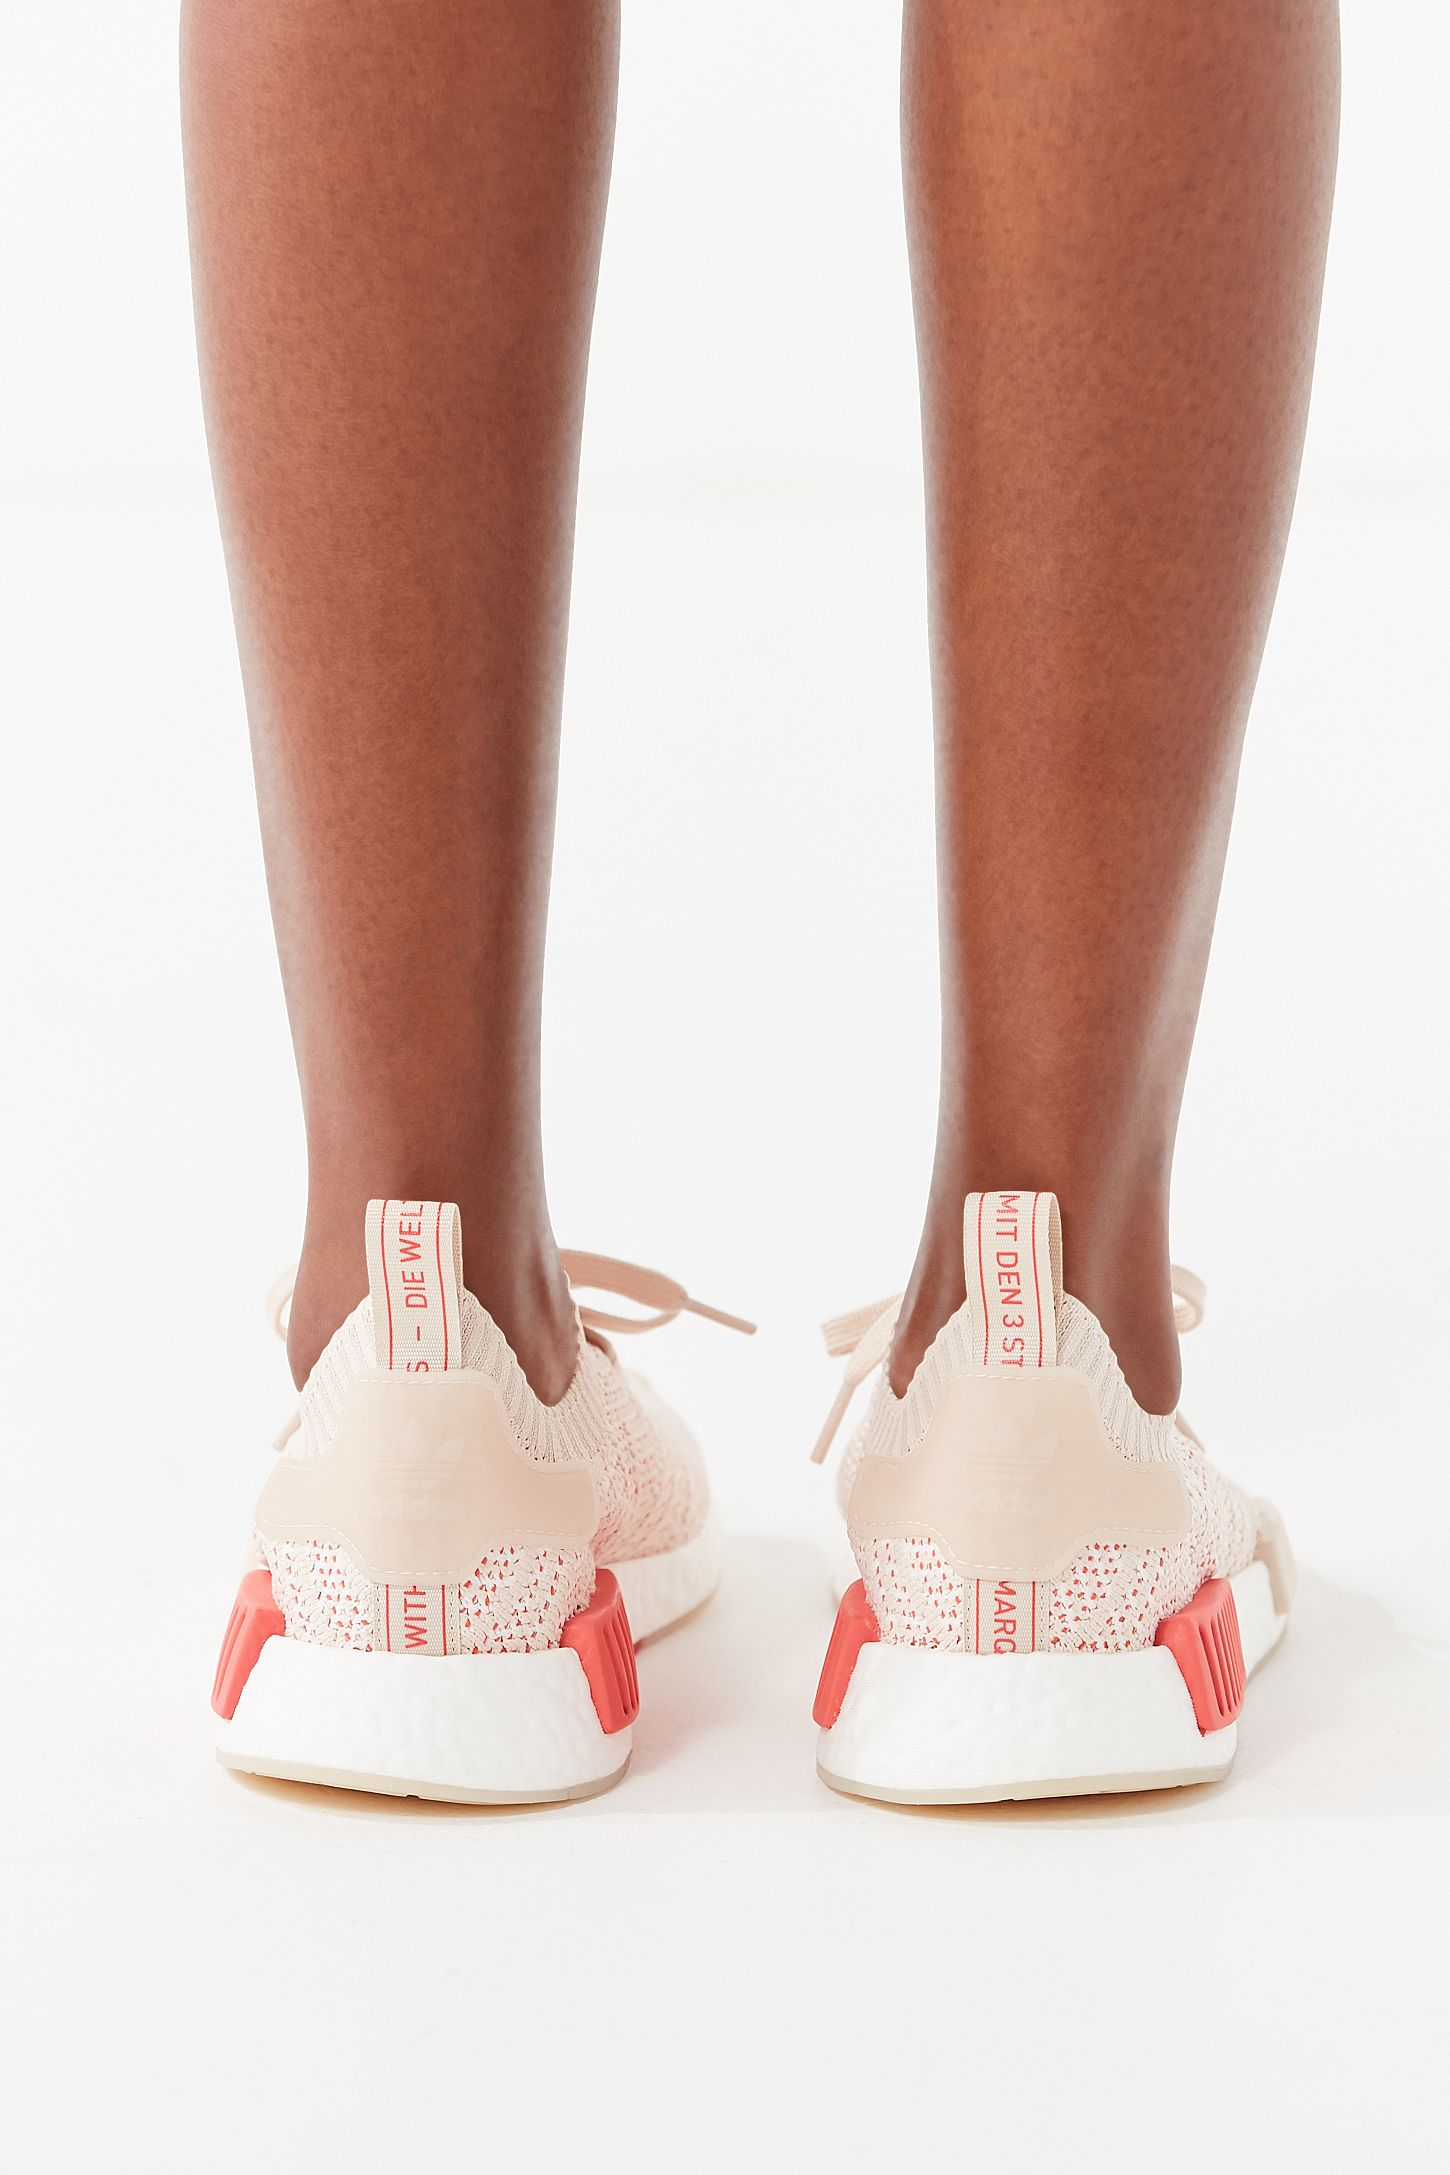 adidas Originals NMD R1 STLT Primeknit Sneaker ARL4r